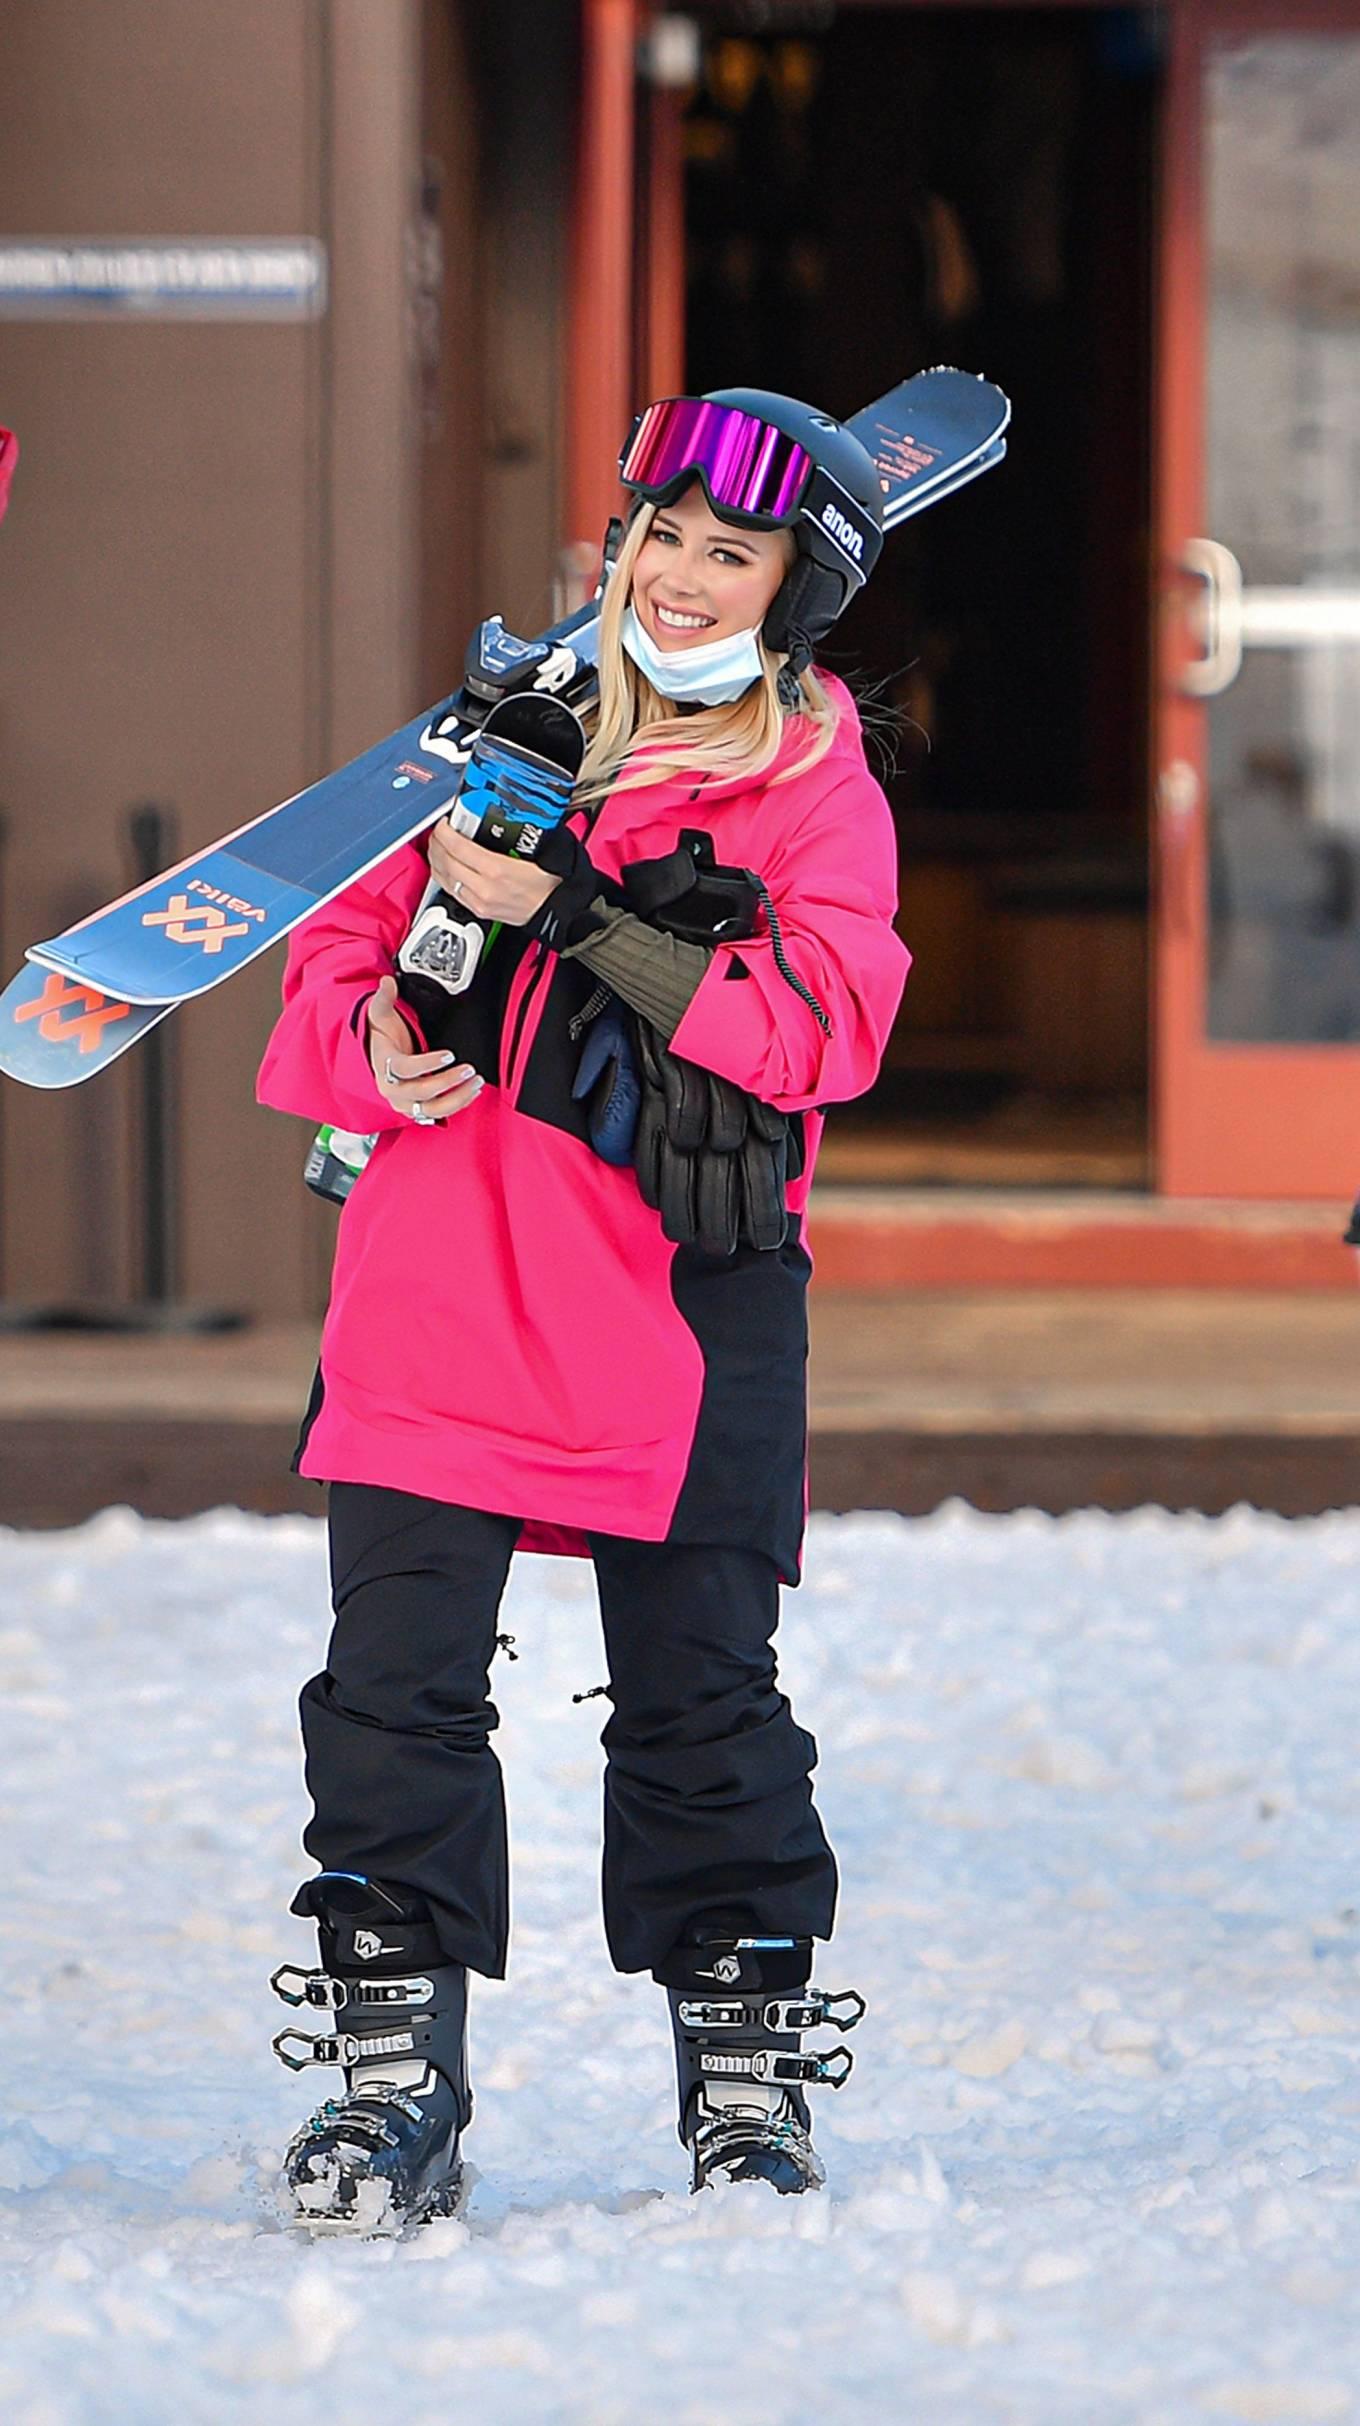 Heidi Montag - Goes skiing as they film 'The Hills: New Beginnings' in Lake Tahoe